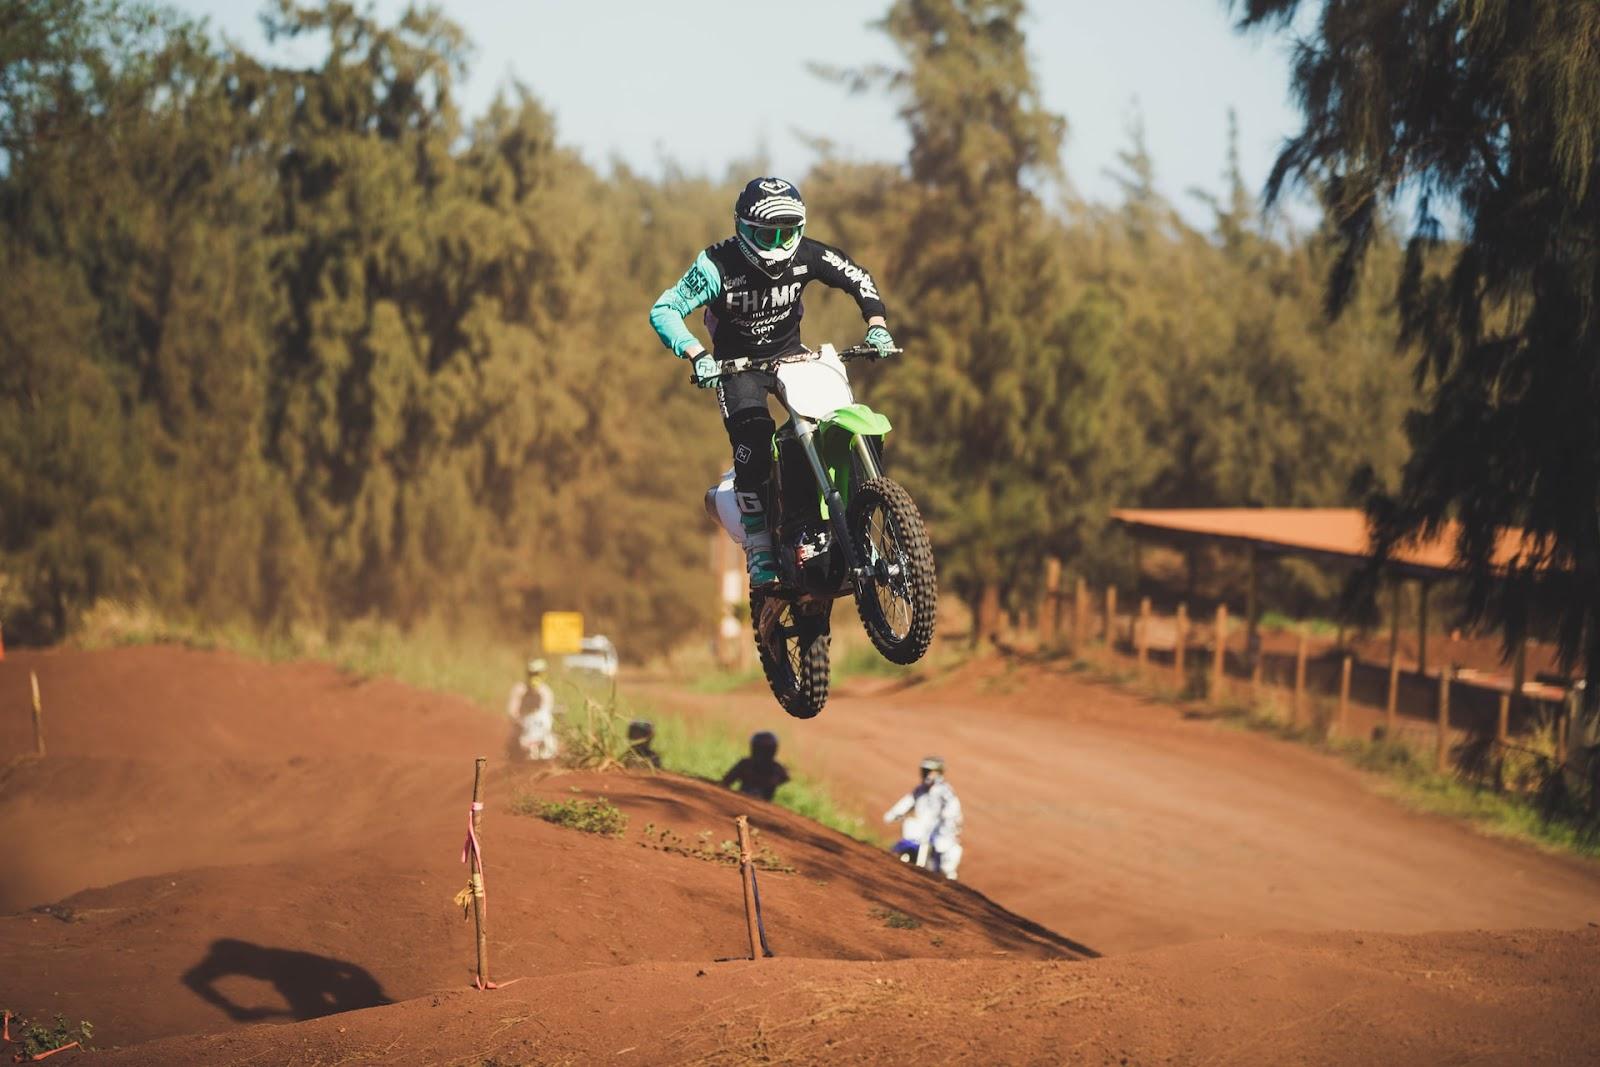 sport community bali motocross